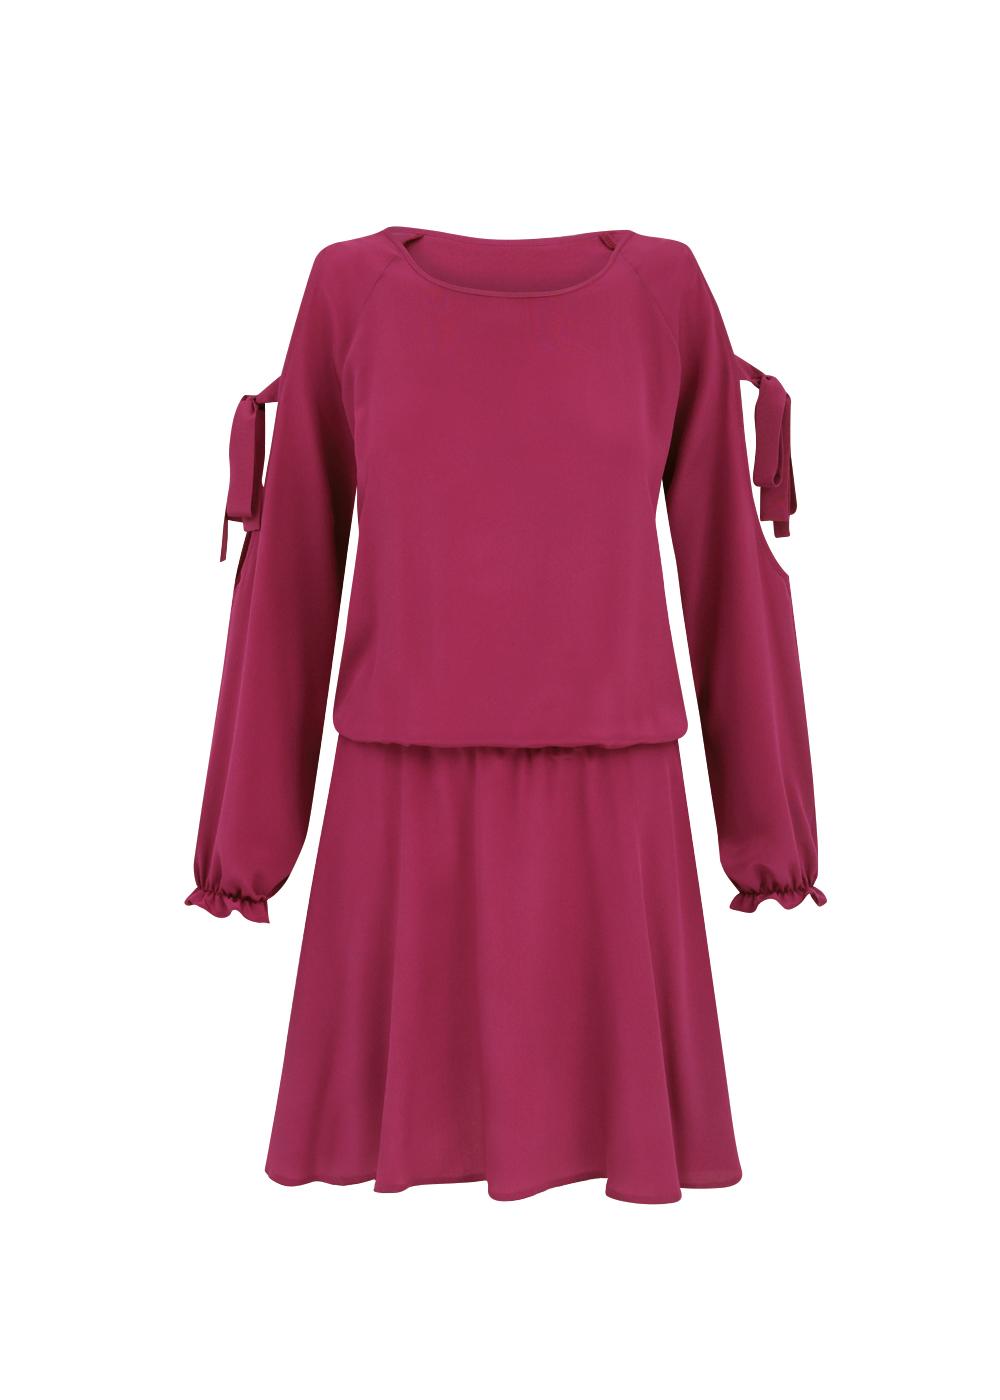 2666-sukienka-jedwabna-monte-carlo